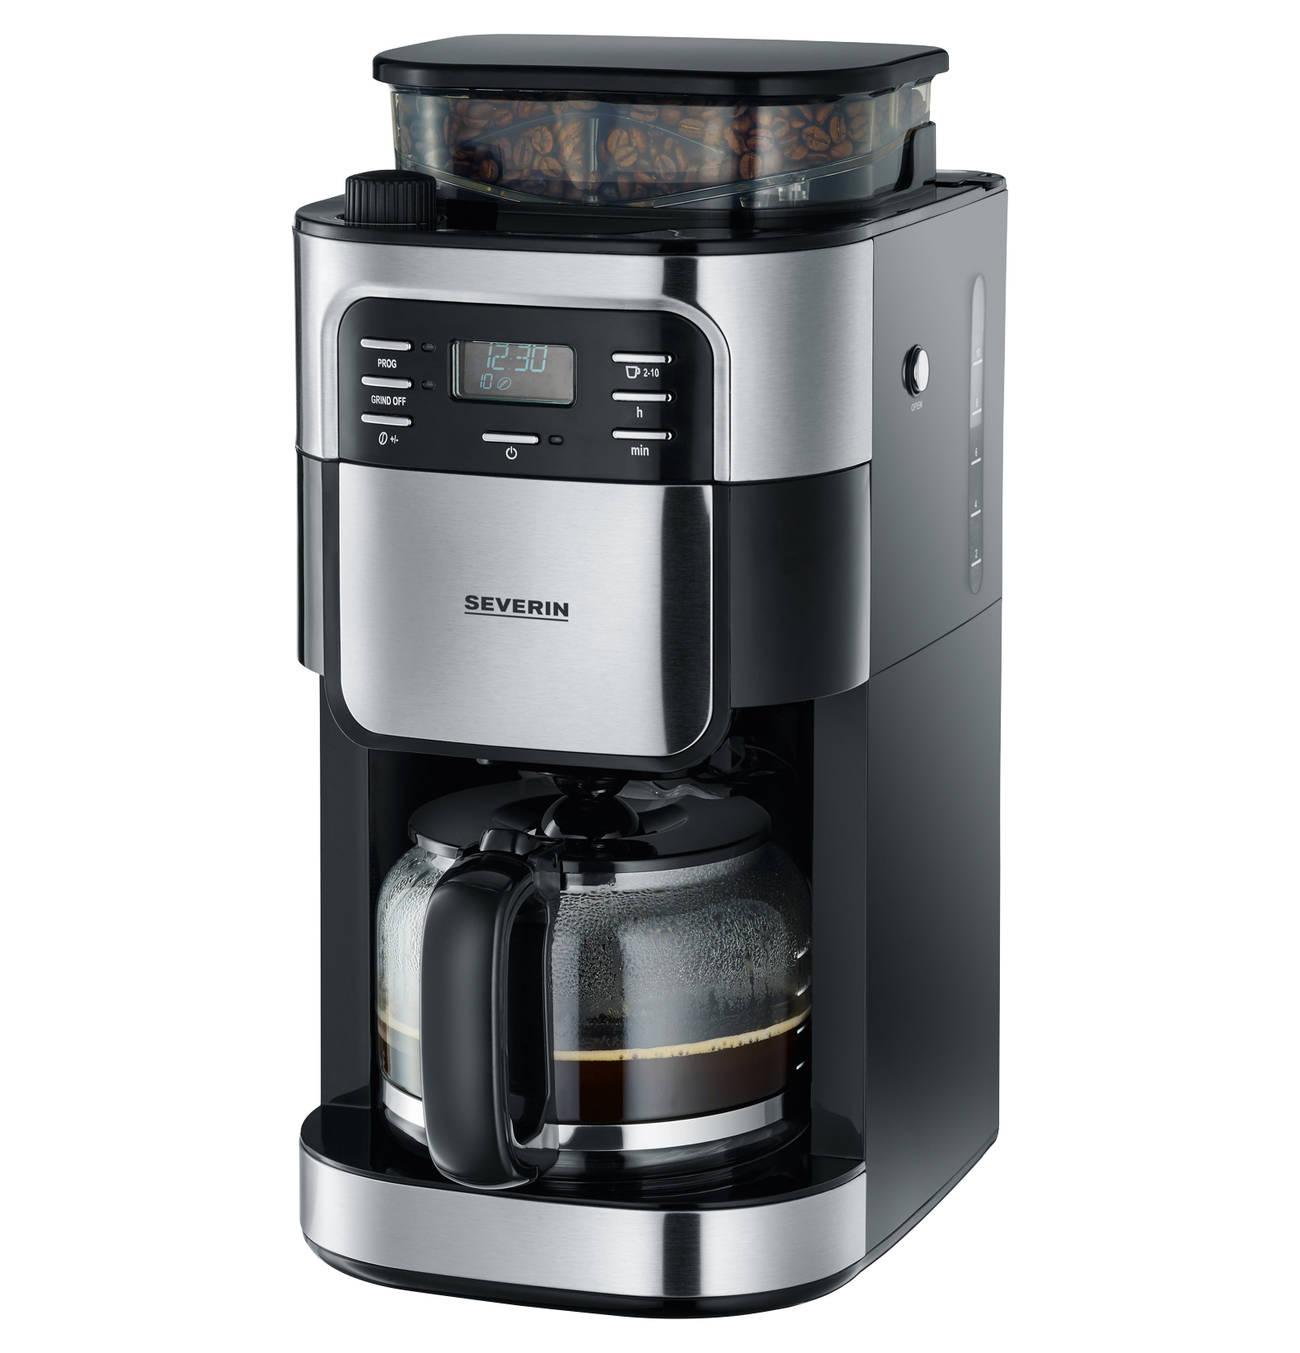 Kaffeeautomat Mit Mahlwerk Ka 4810 Kaffeeautomaten Kaffeemaschine Und Kaffee